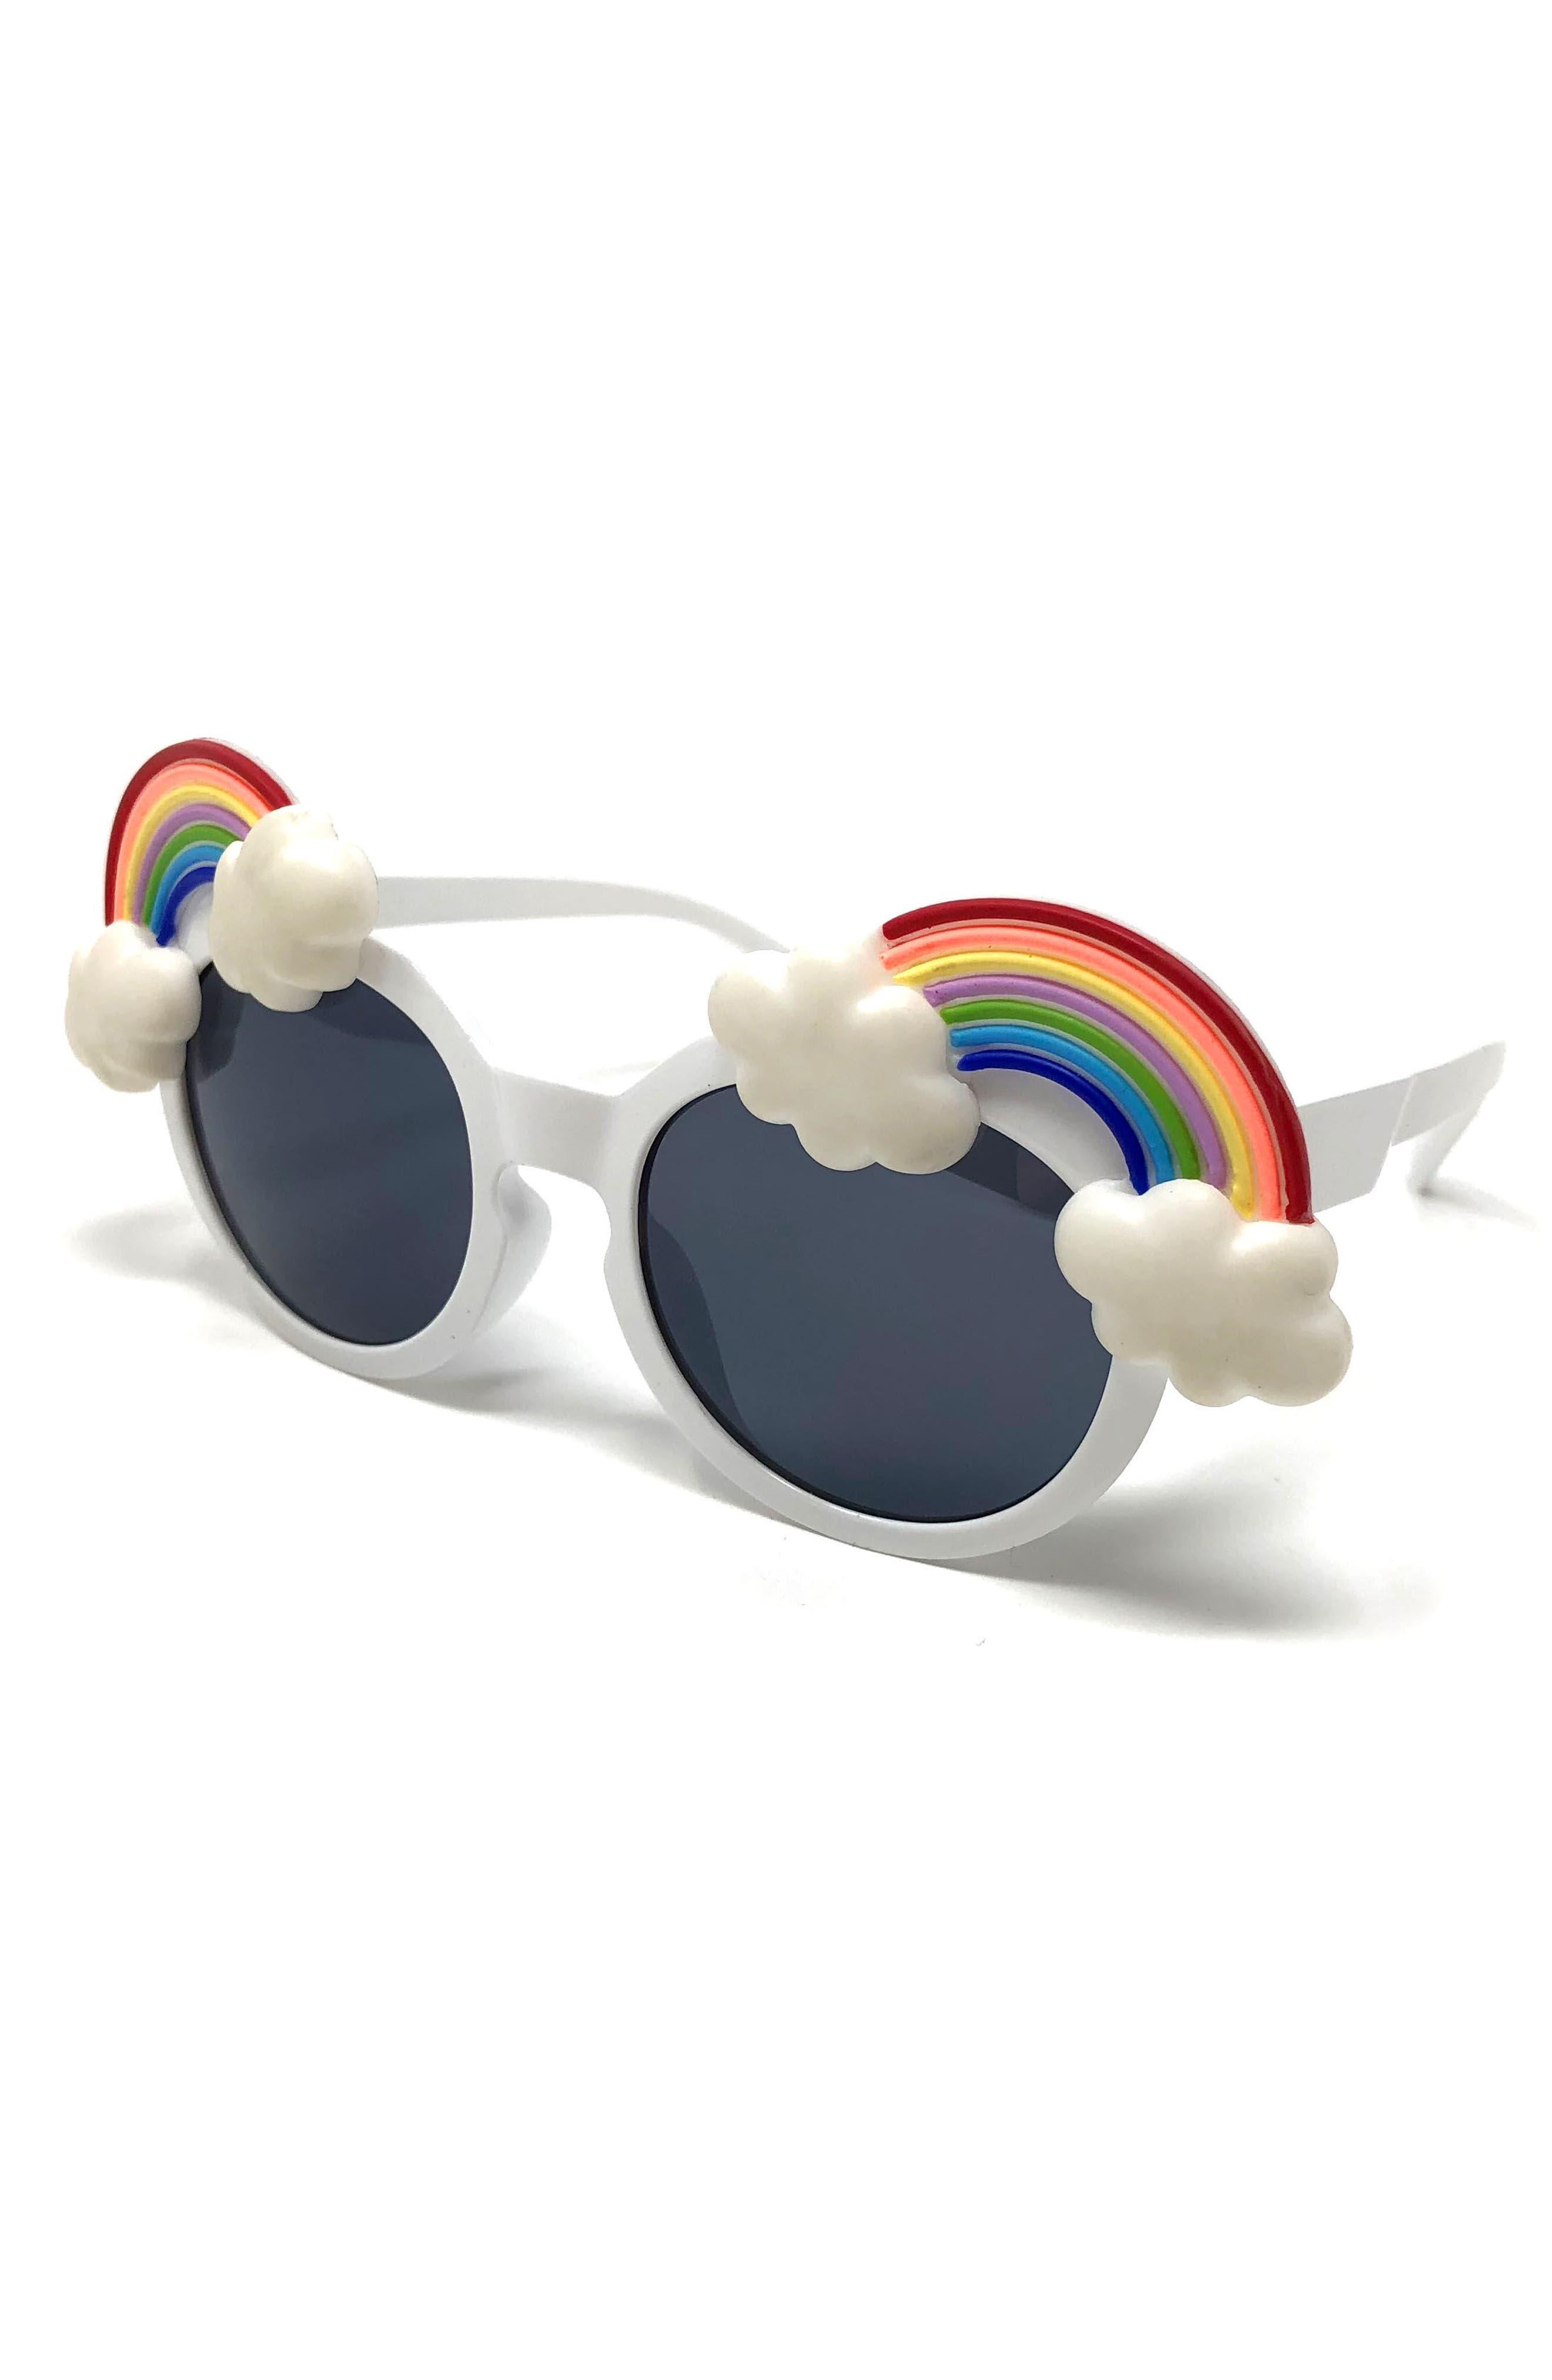 Small Round Rainbow Sunglasses,                             Alternate thumbnail 2, color,                             WHITE/RAINBOW